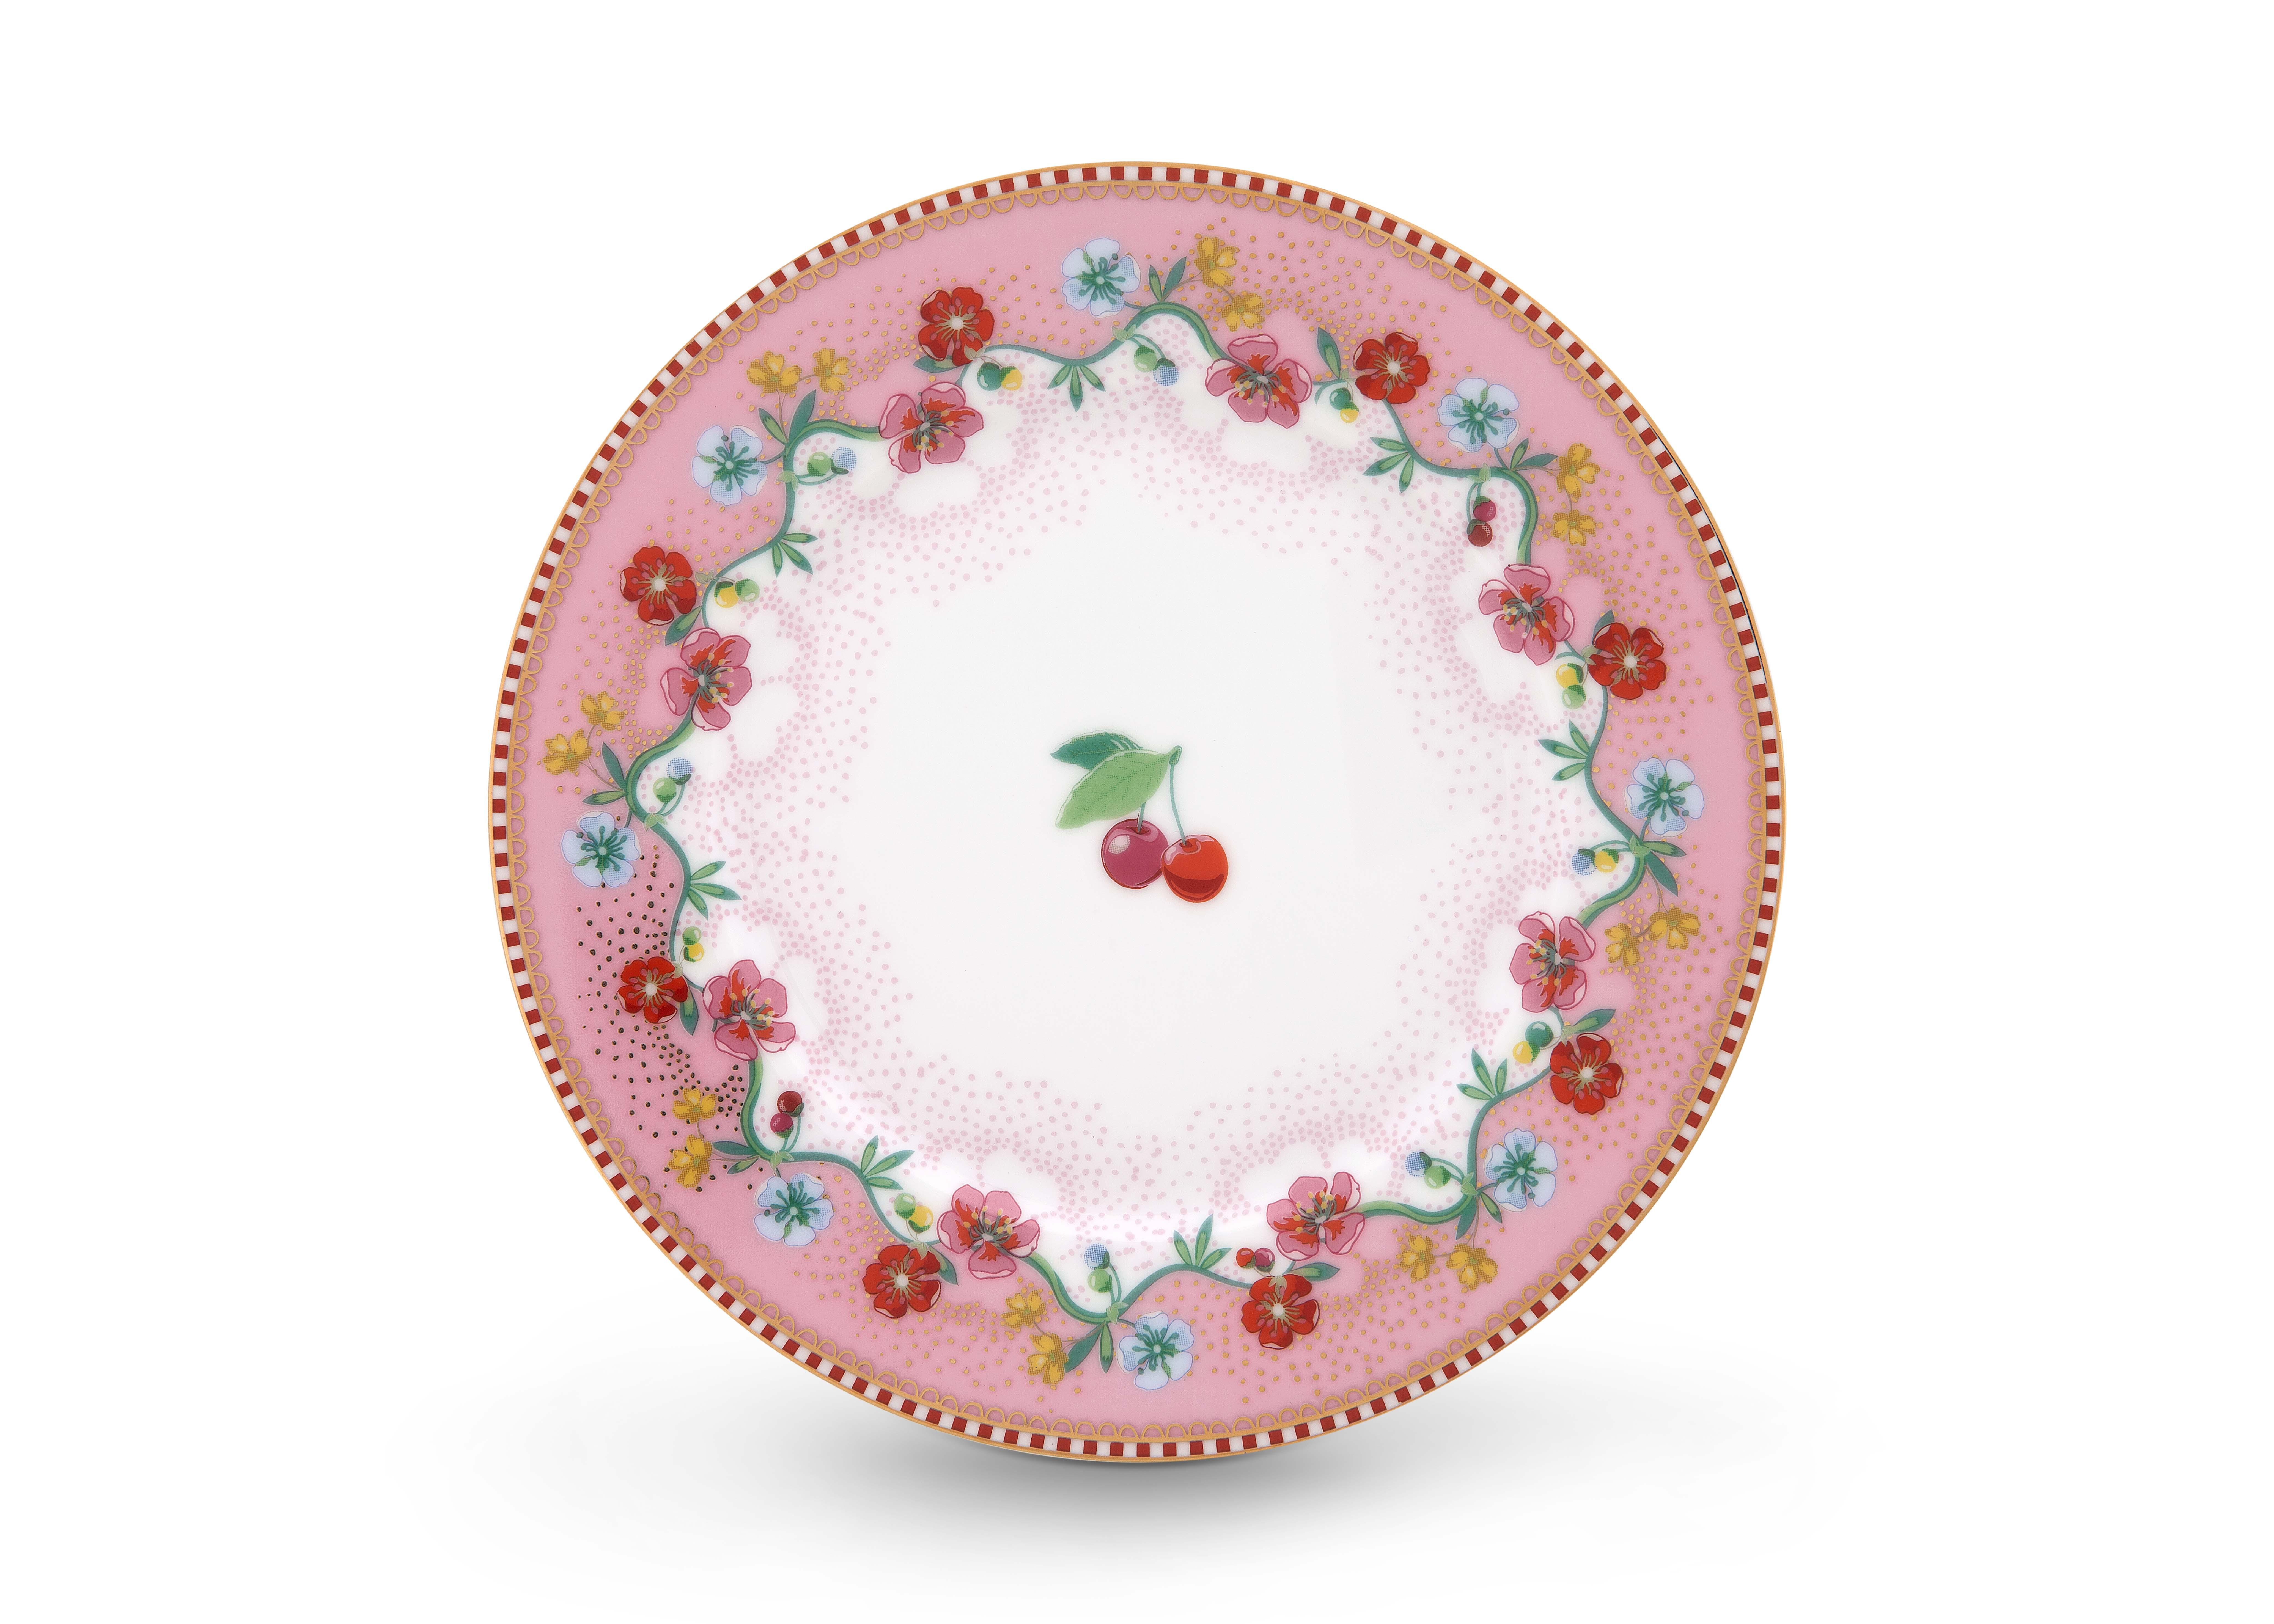 Набор из 2 тарелок Floral